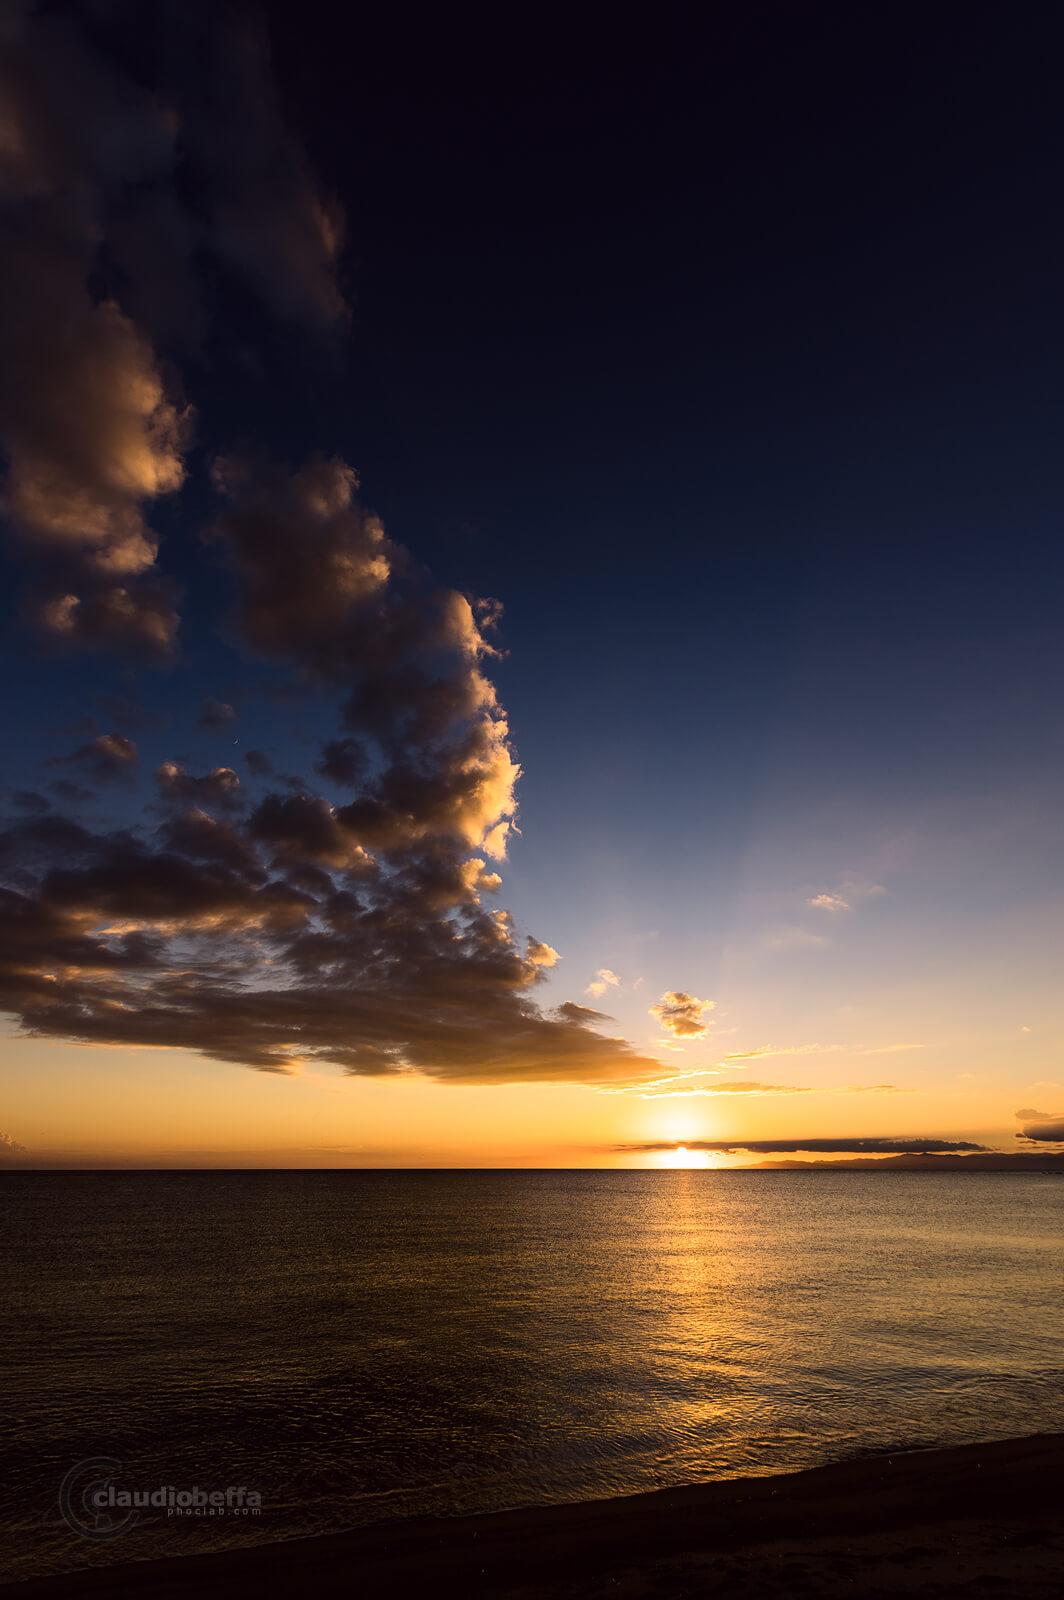 Sunset, Sun, Seascape, Light, Sky, Clouds, Moon, Beach, Sardinia, Italy, Last light